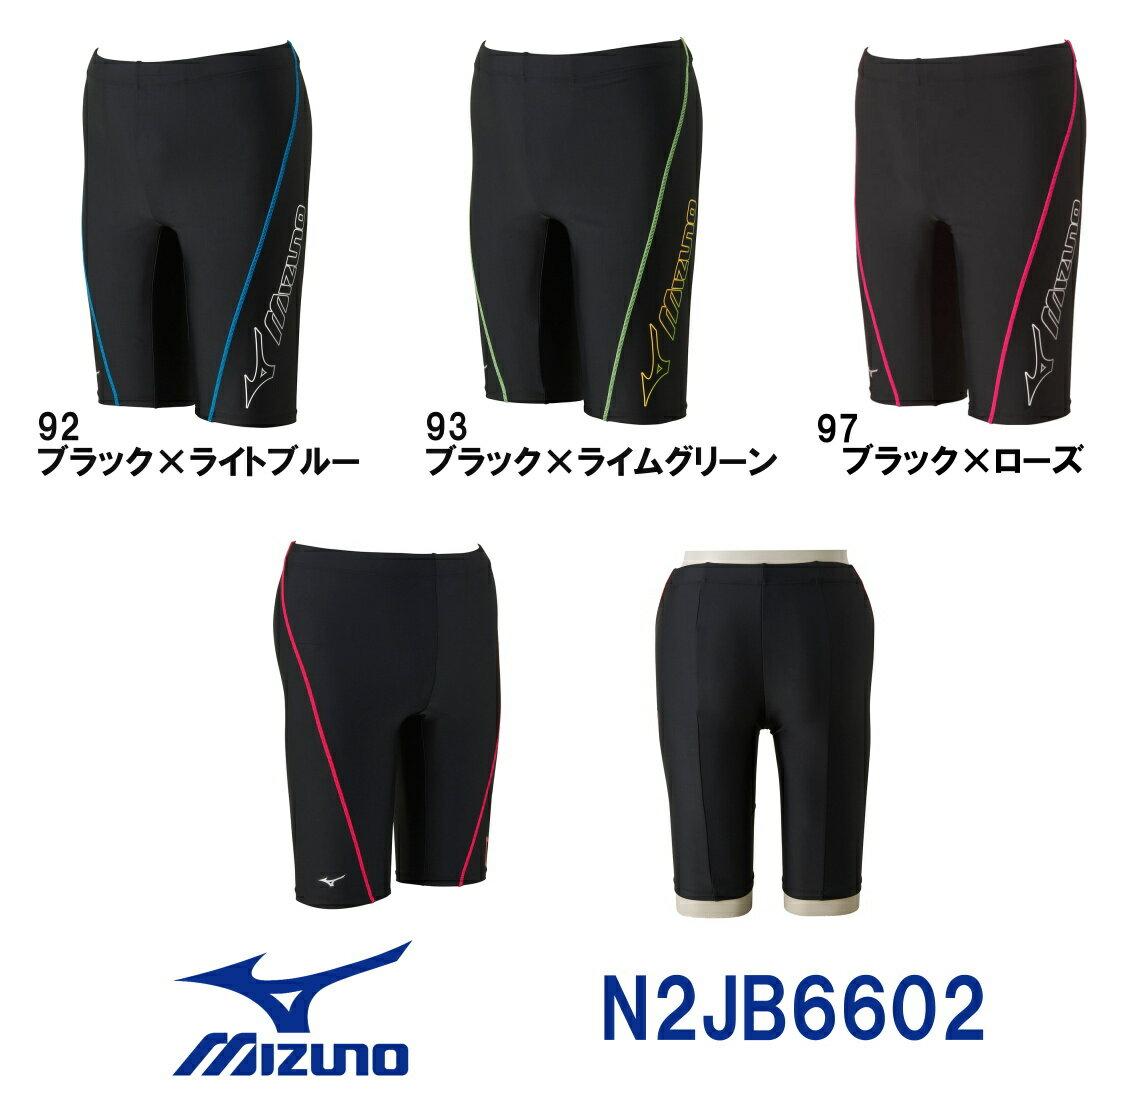 【N2JB6602】MIZUNO(ミズノ)メンズフィットネス水着ソフトシルキーUVハーフスパッツL